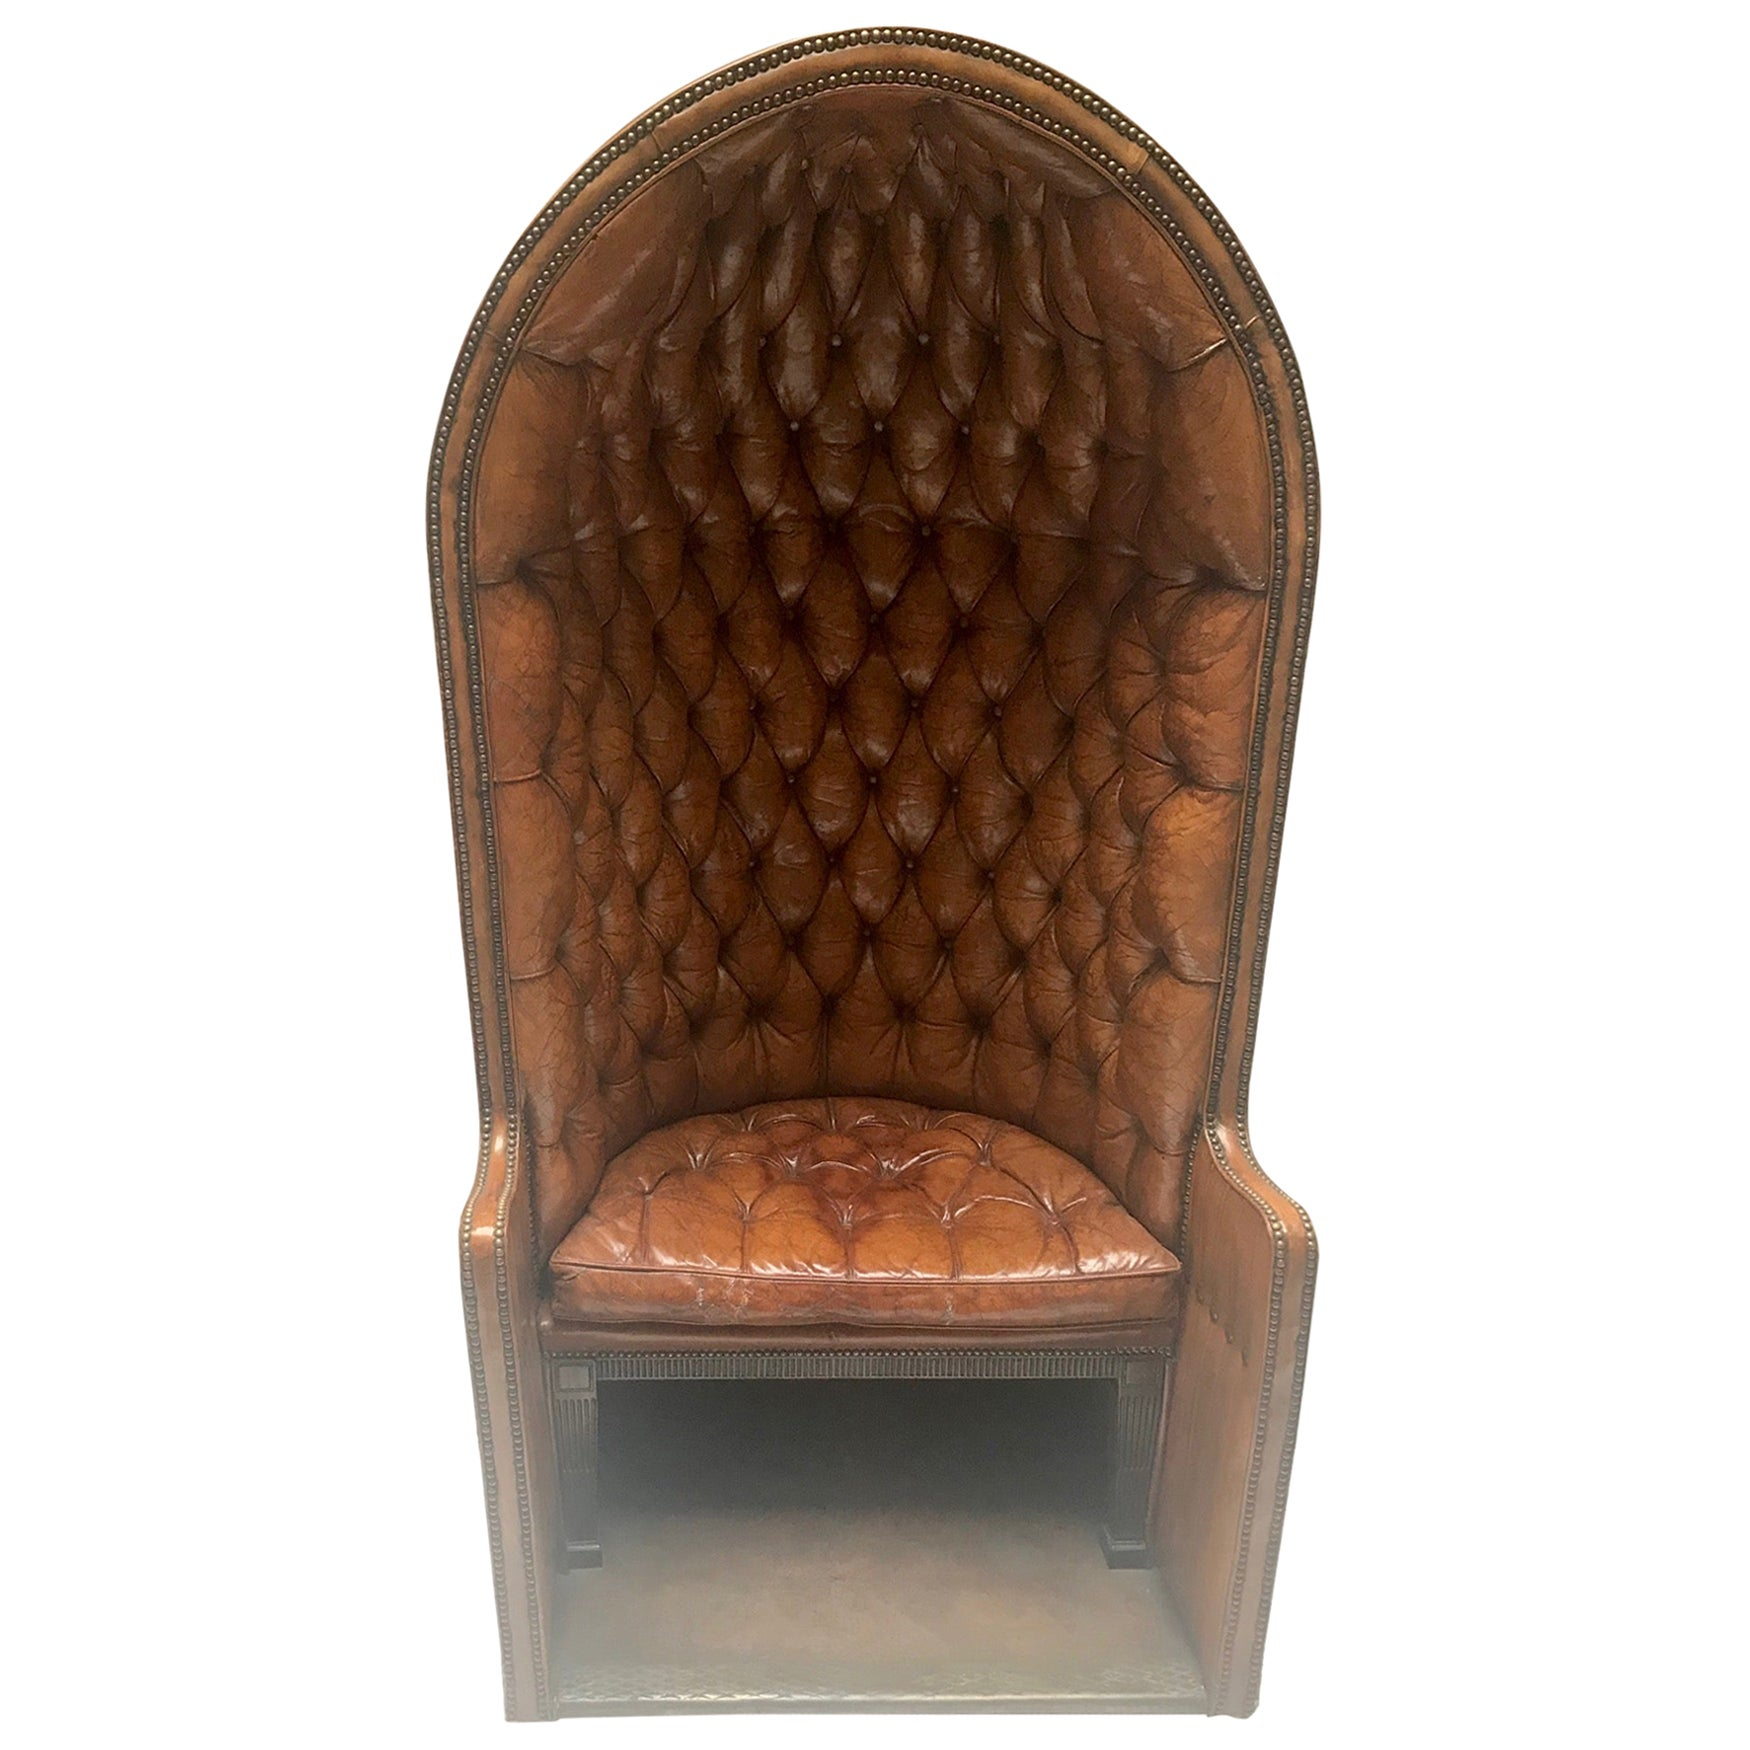 Porter's Chair Having Belonged to Claude François